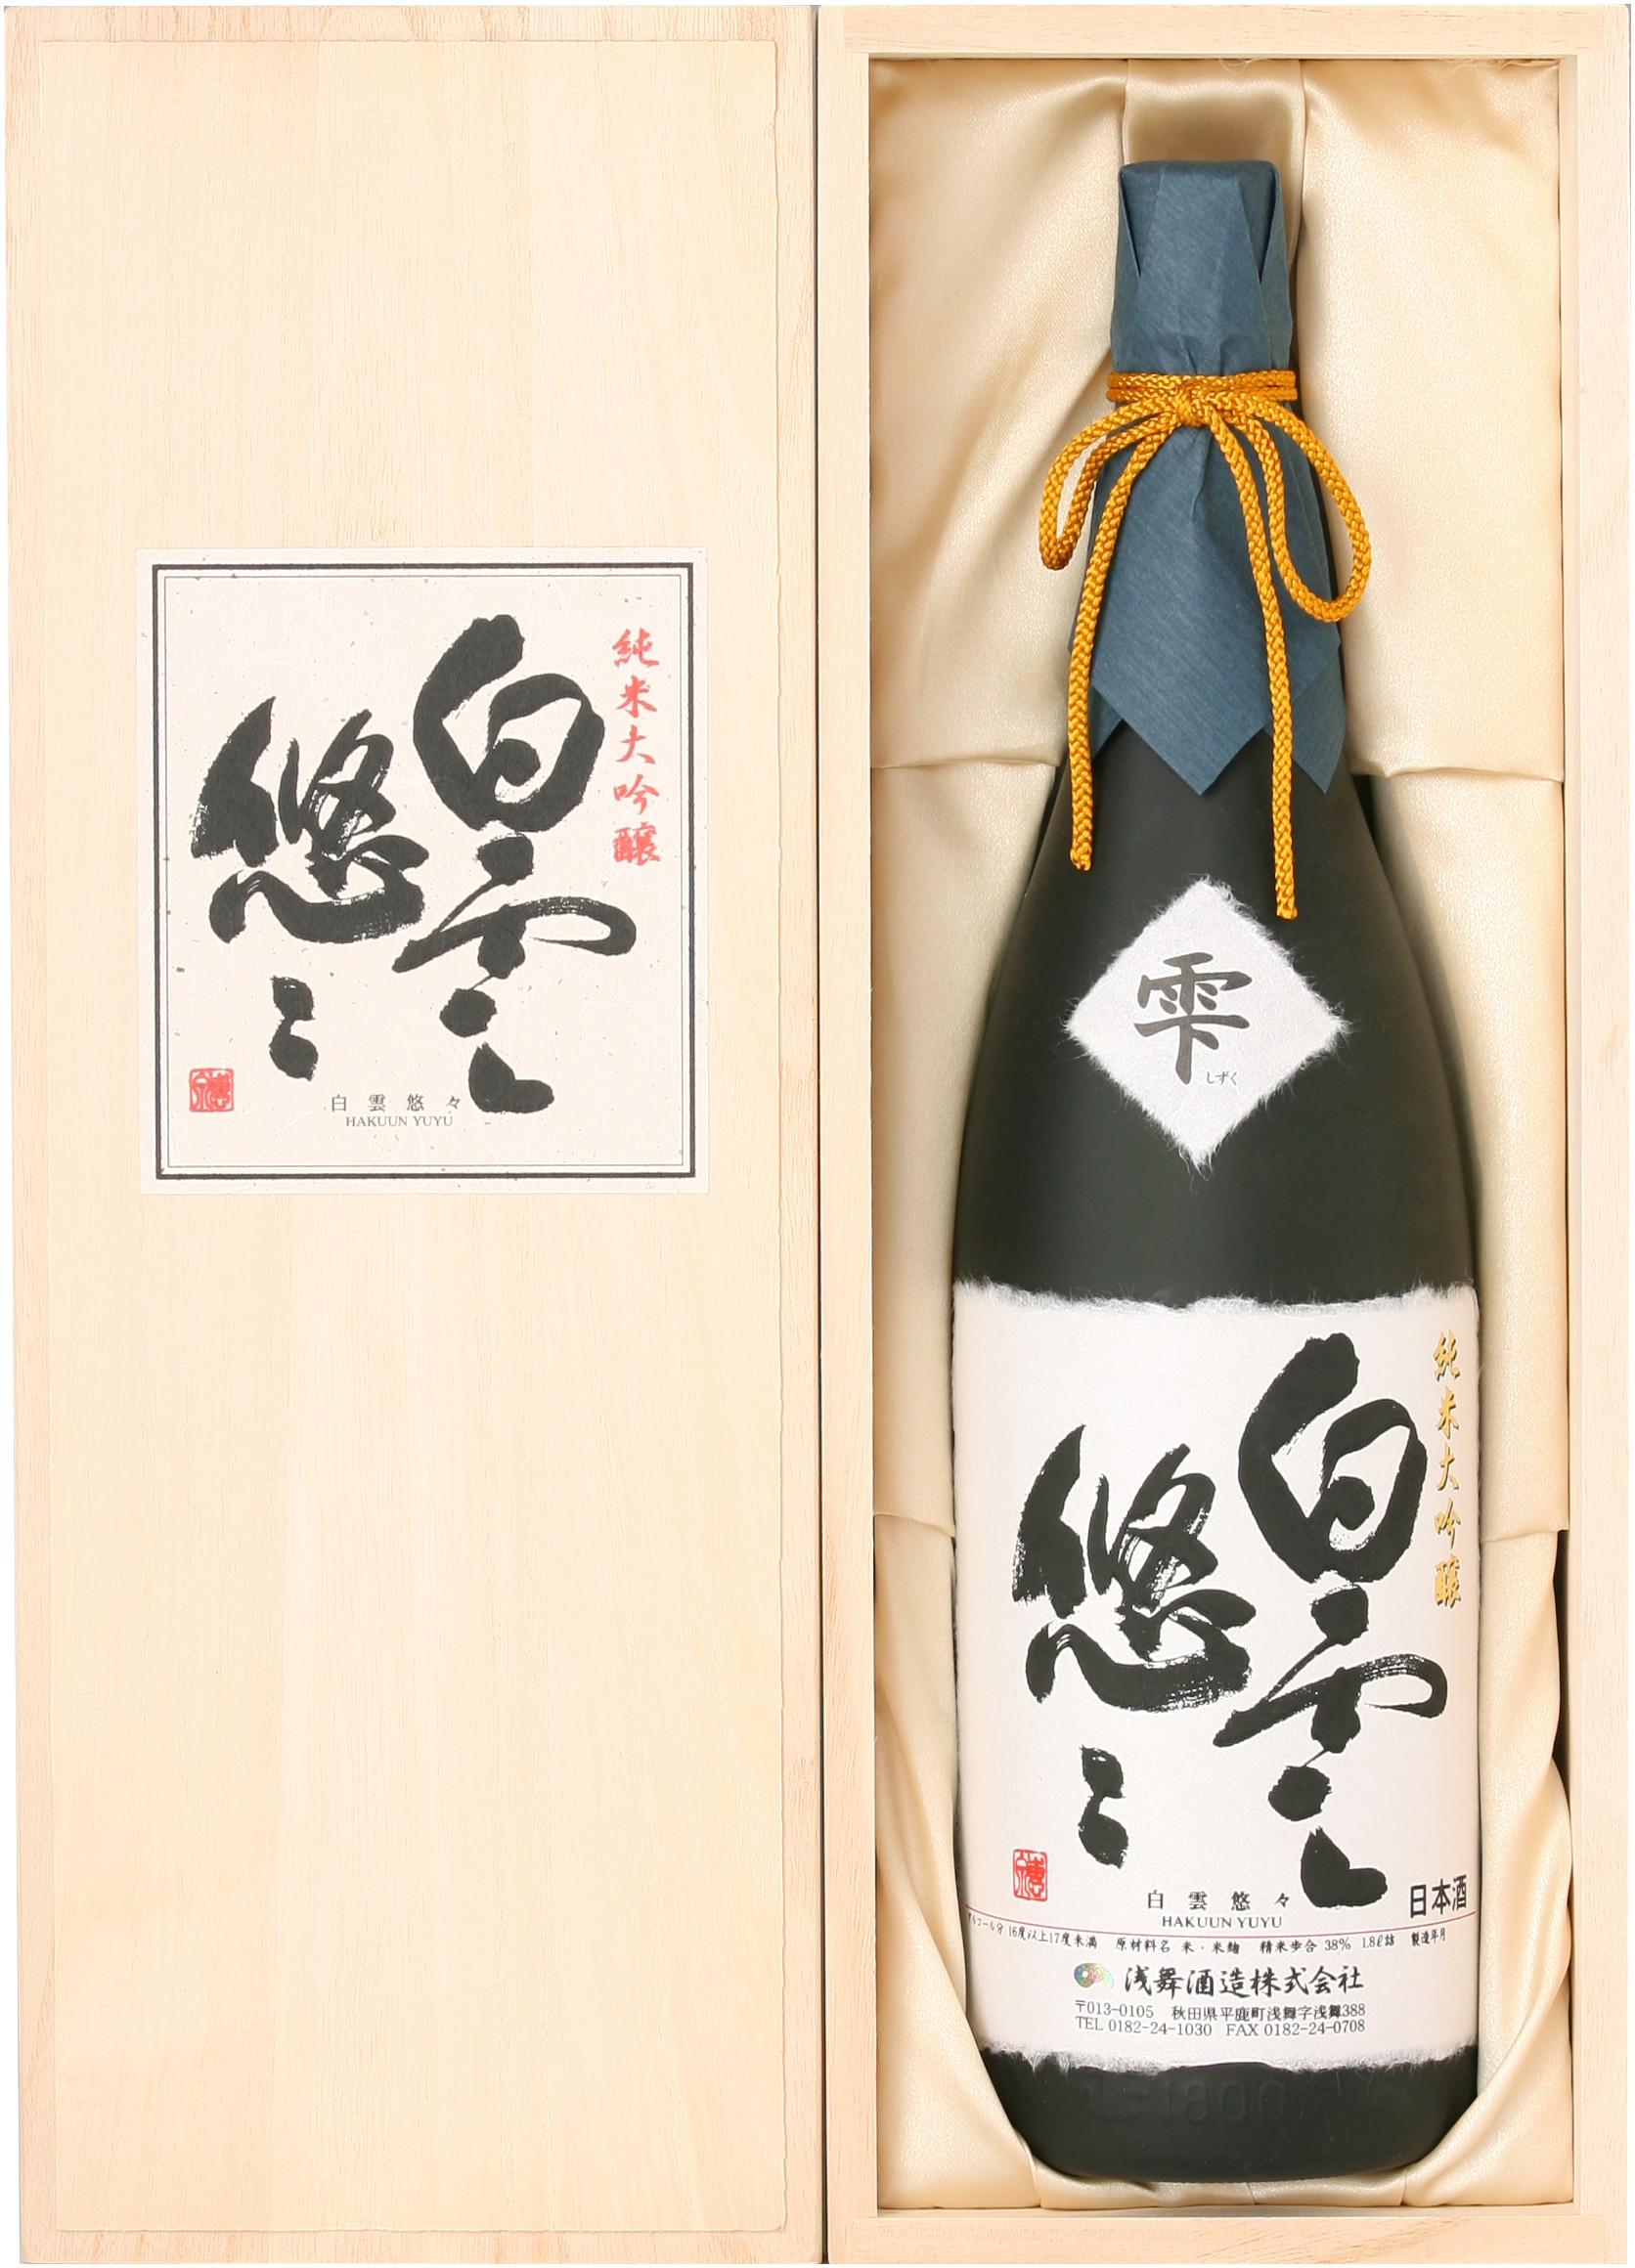 <2019 敬老の日ギフト>【酒類】浅舞酒蔵 純米大吟醸 白雲悠々 雫酒 1800ml 送料込